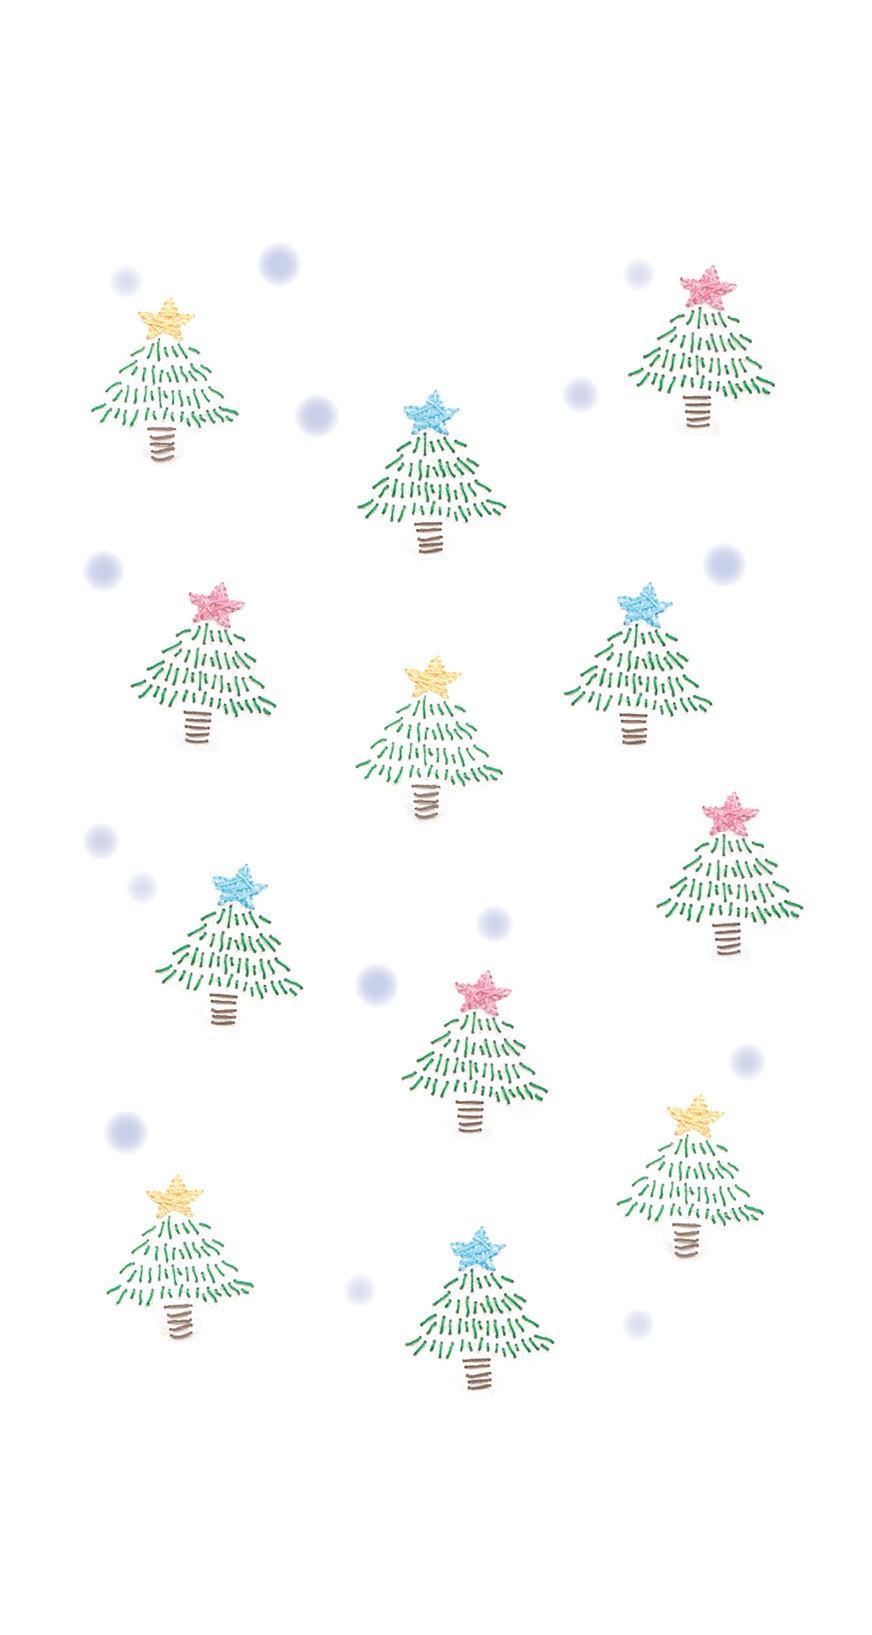 Iphone壁紙 クリスマスツリー ツキシロクミ Note